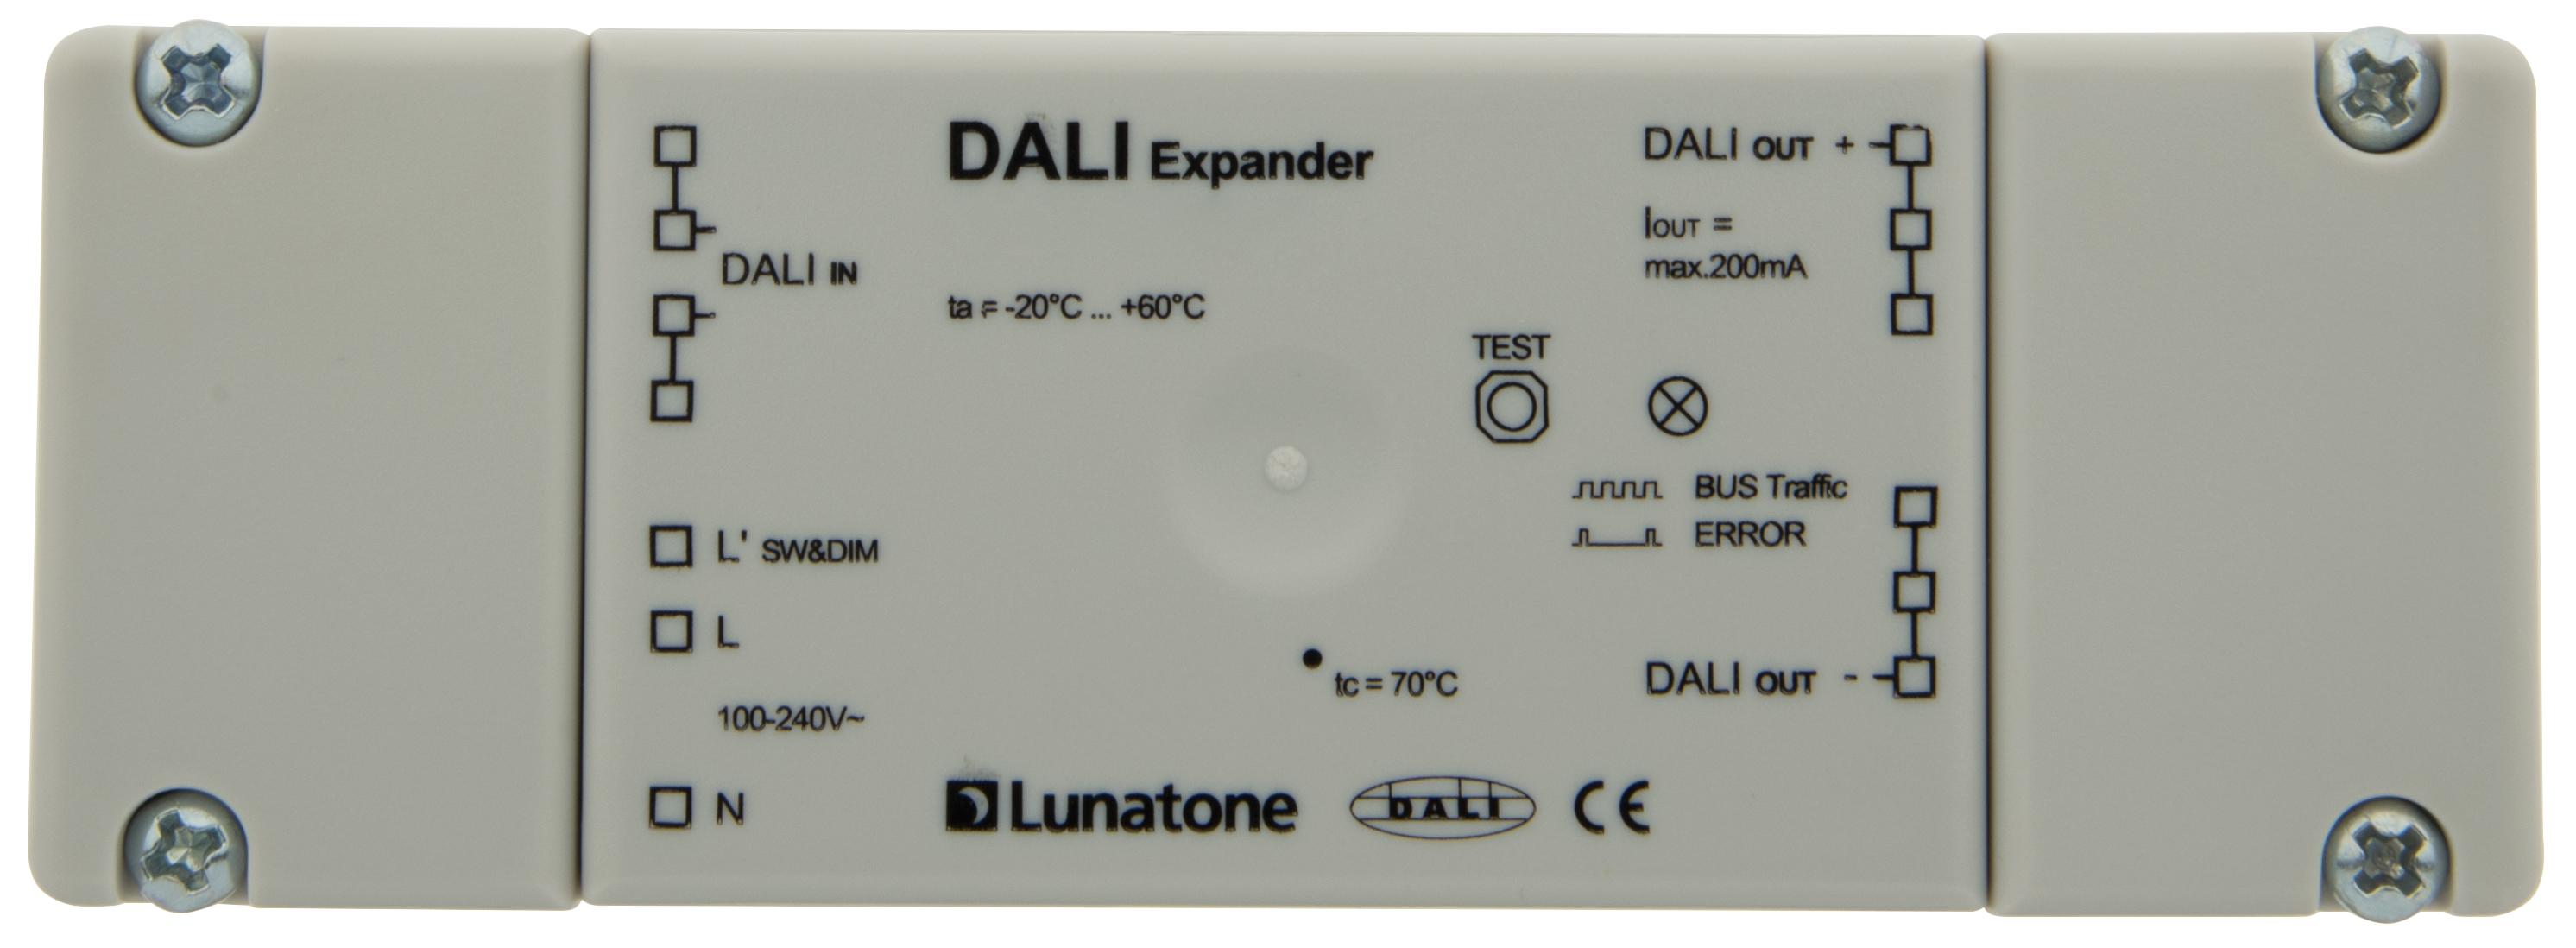 1 Stk DALI Expander LILC004164